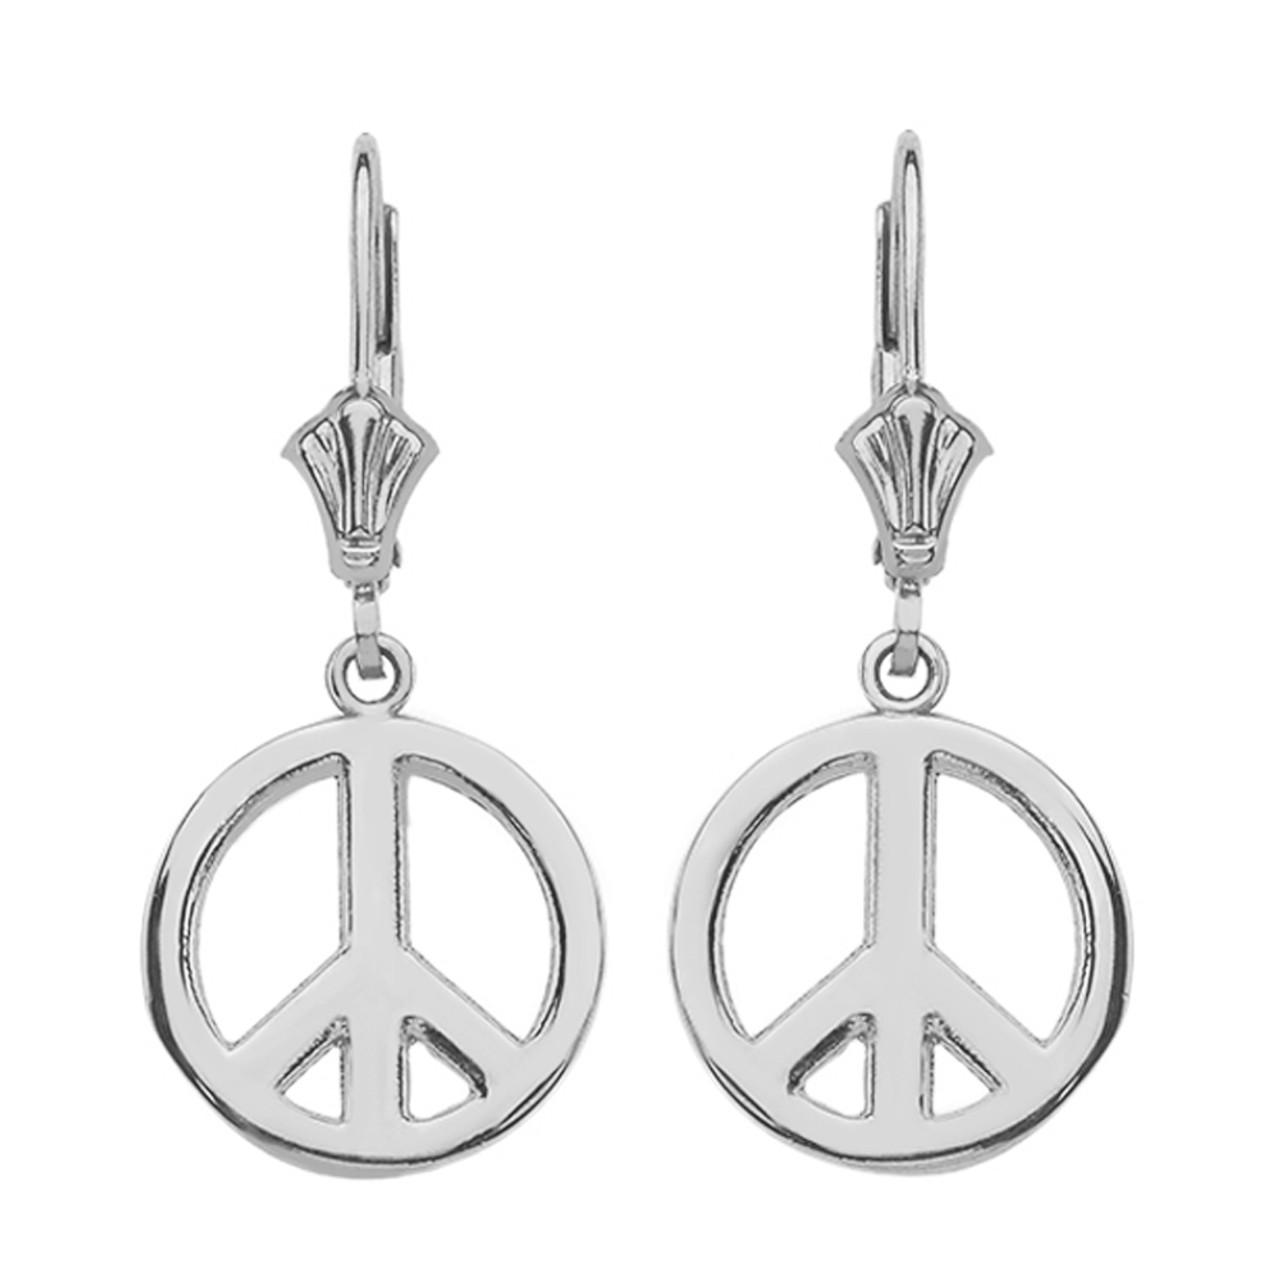 4469c1b0af362 14K White Gold Boho Peace Sign Earrings